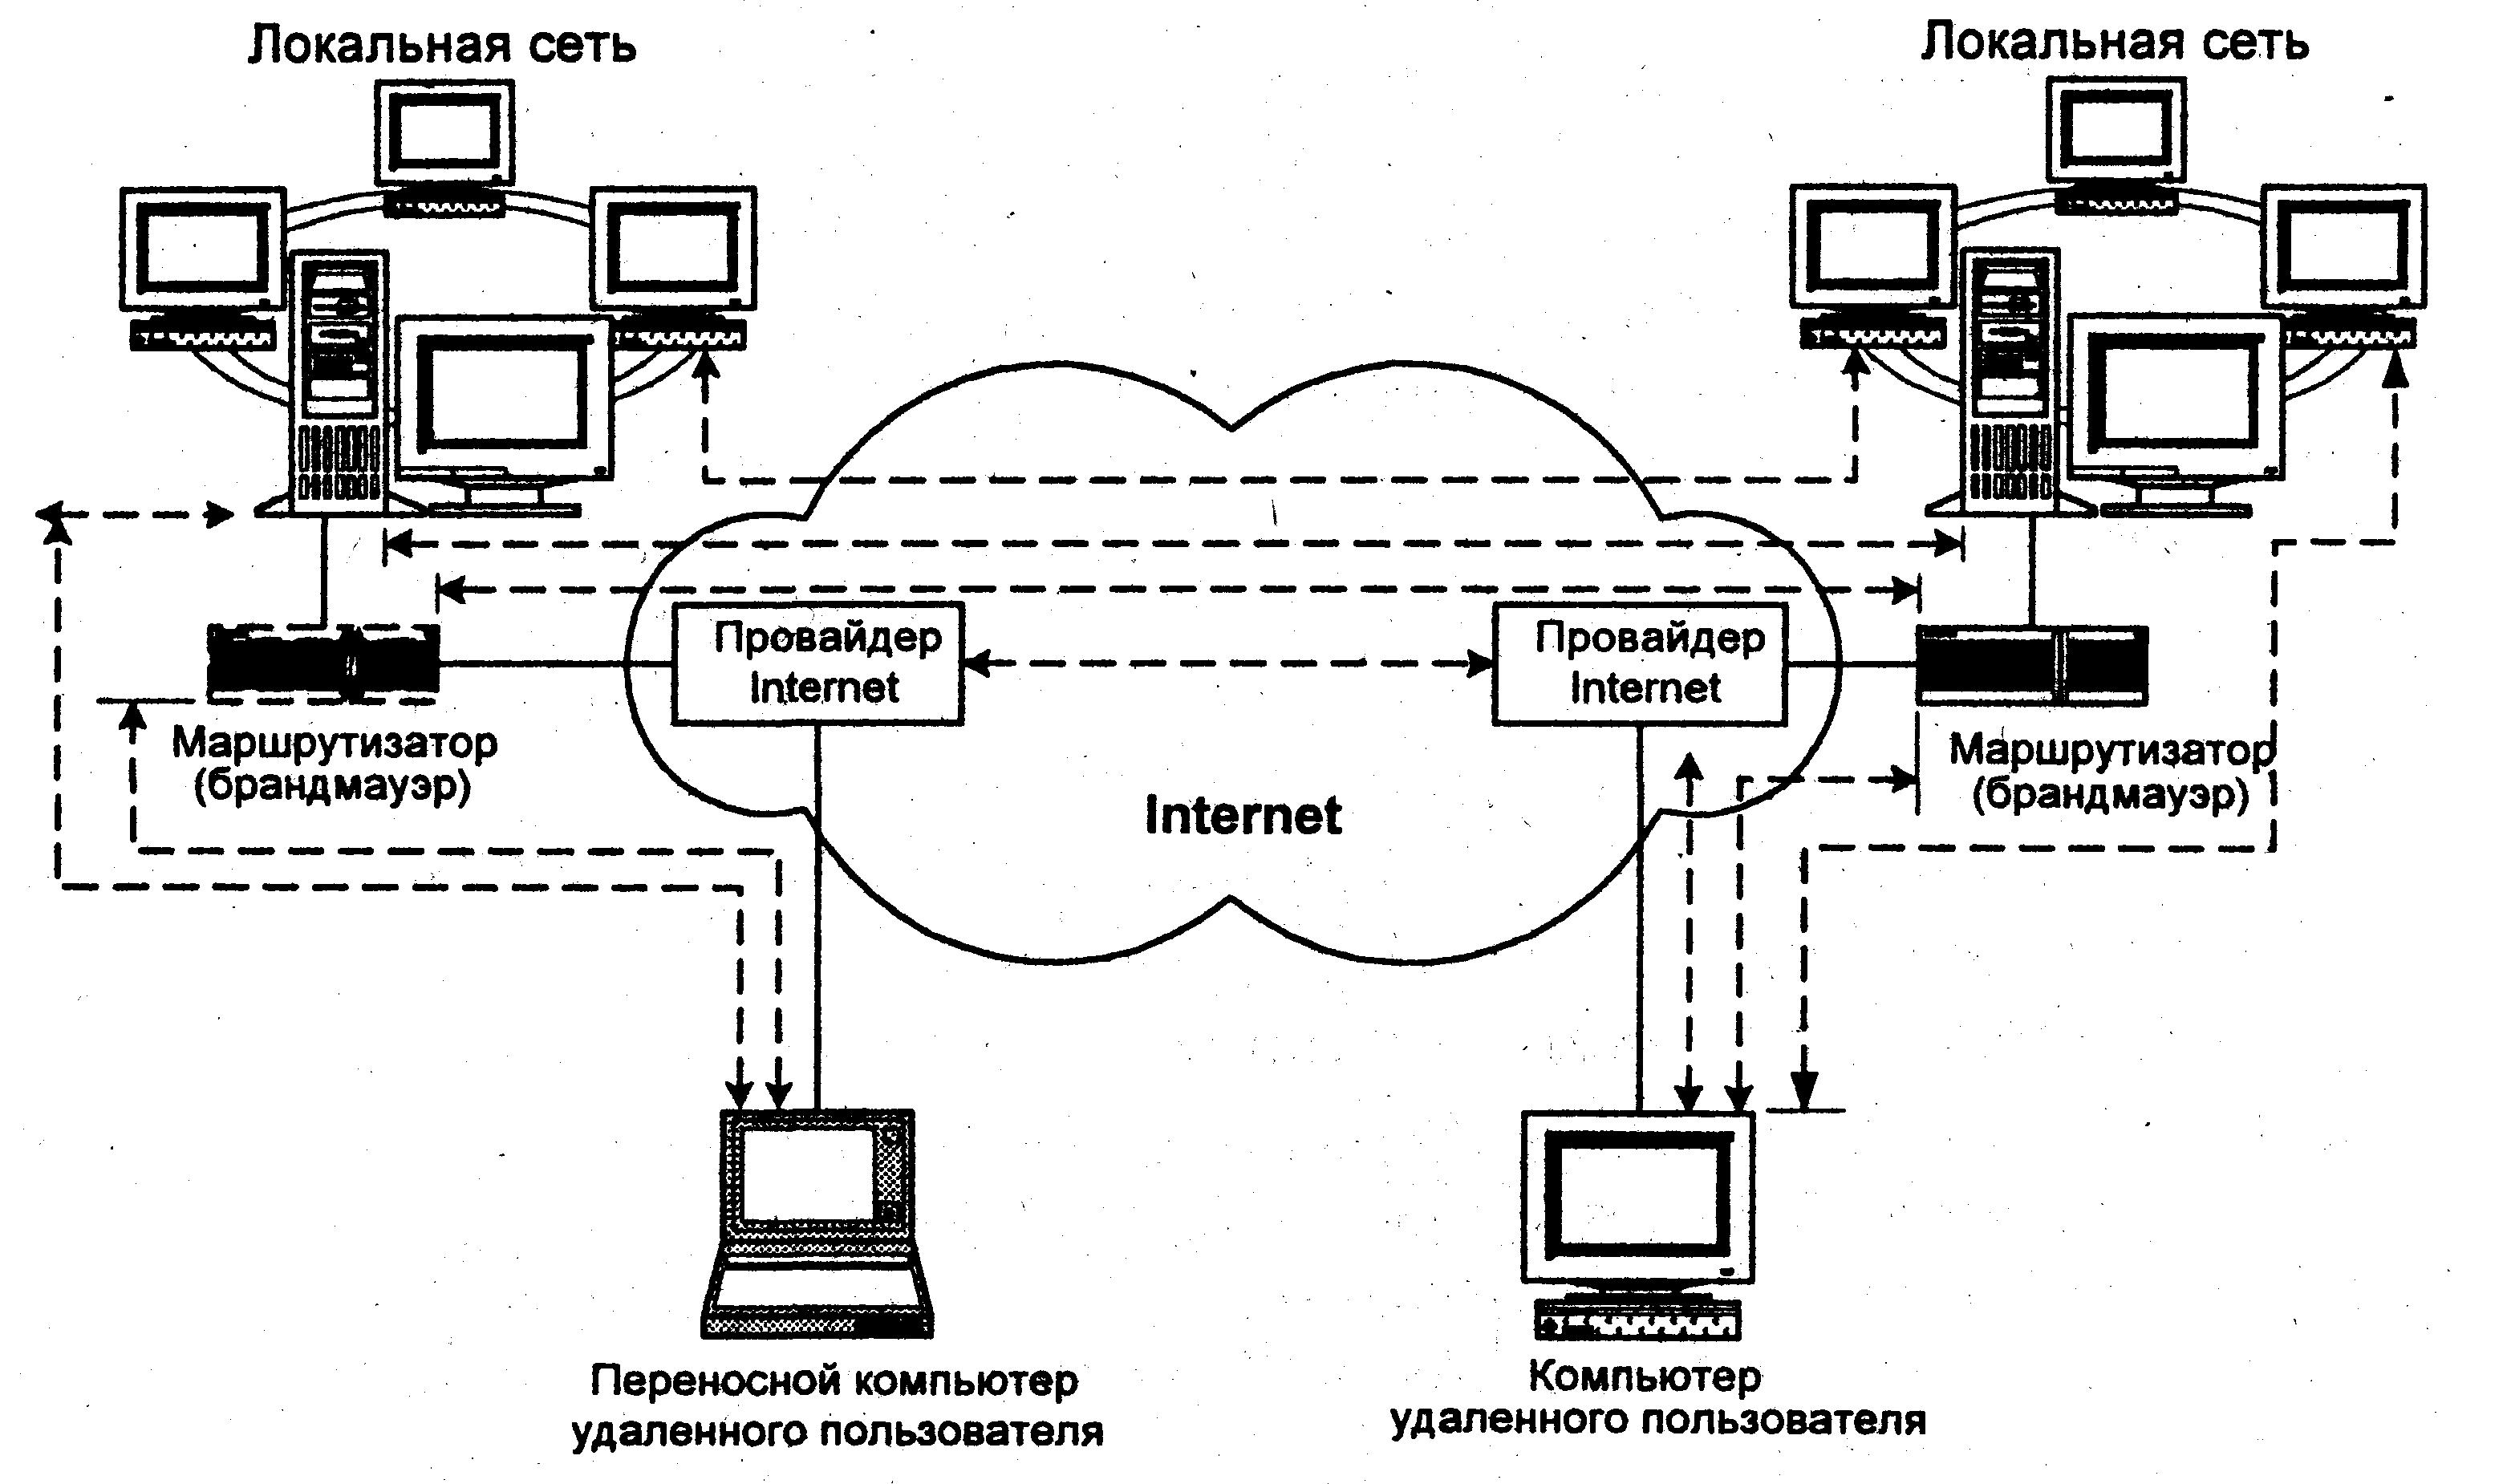 Схема локальной сети картинка